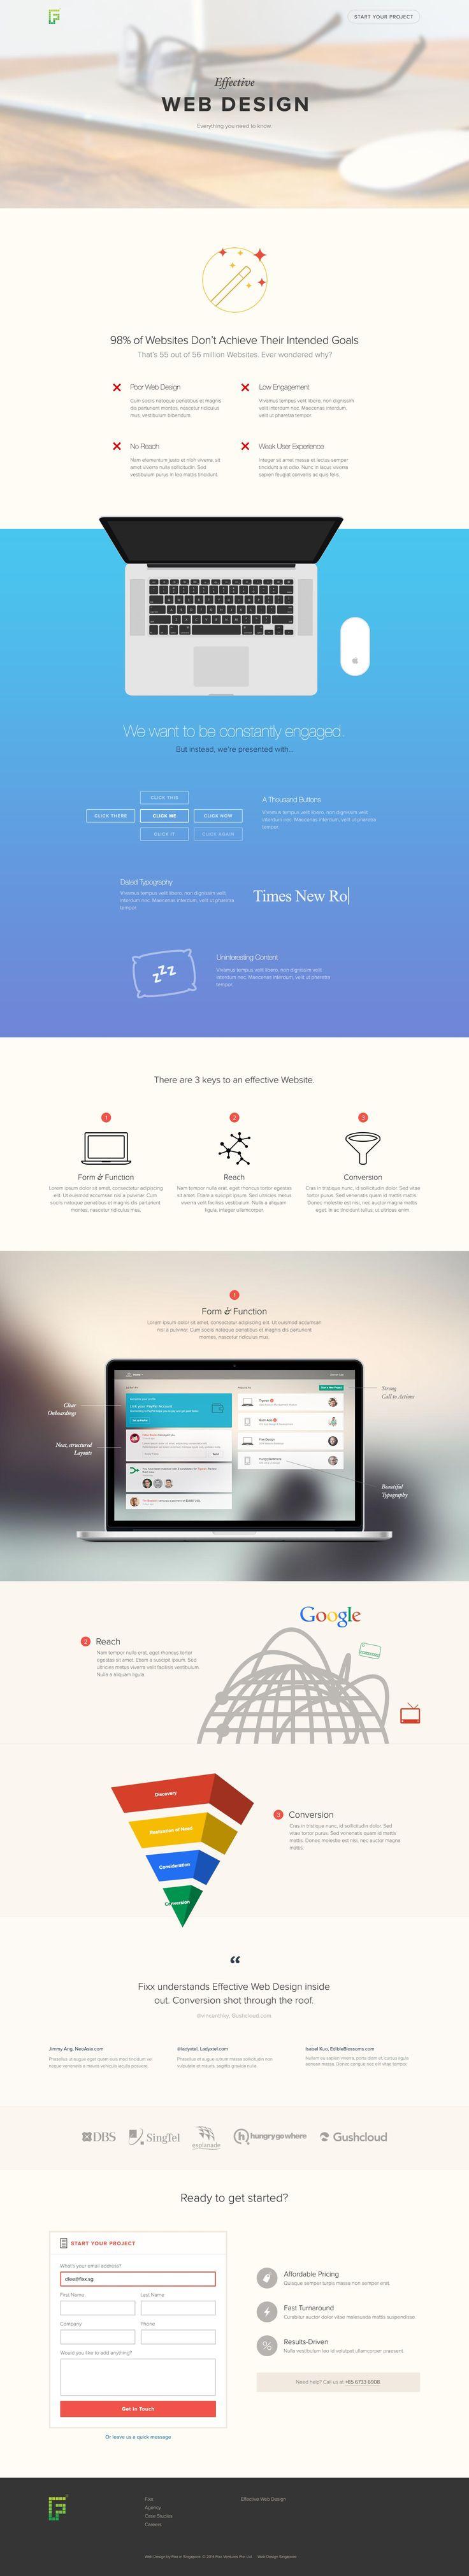 73-effective-web-design-full colorful modern web design website graphic color flat 3d ui ux graphics inspiration